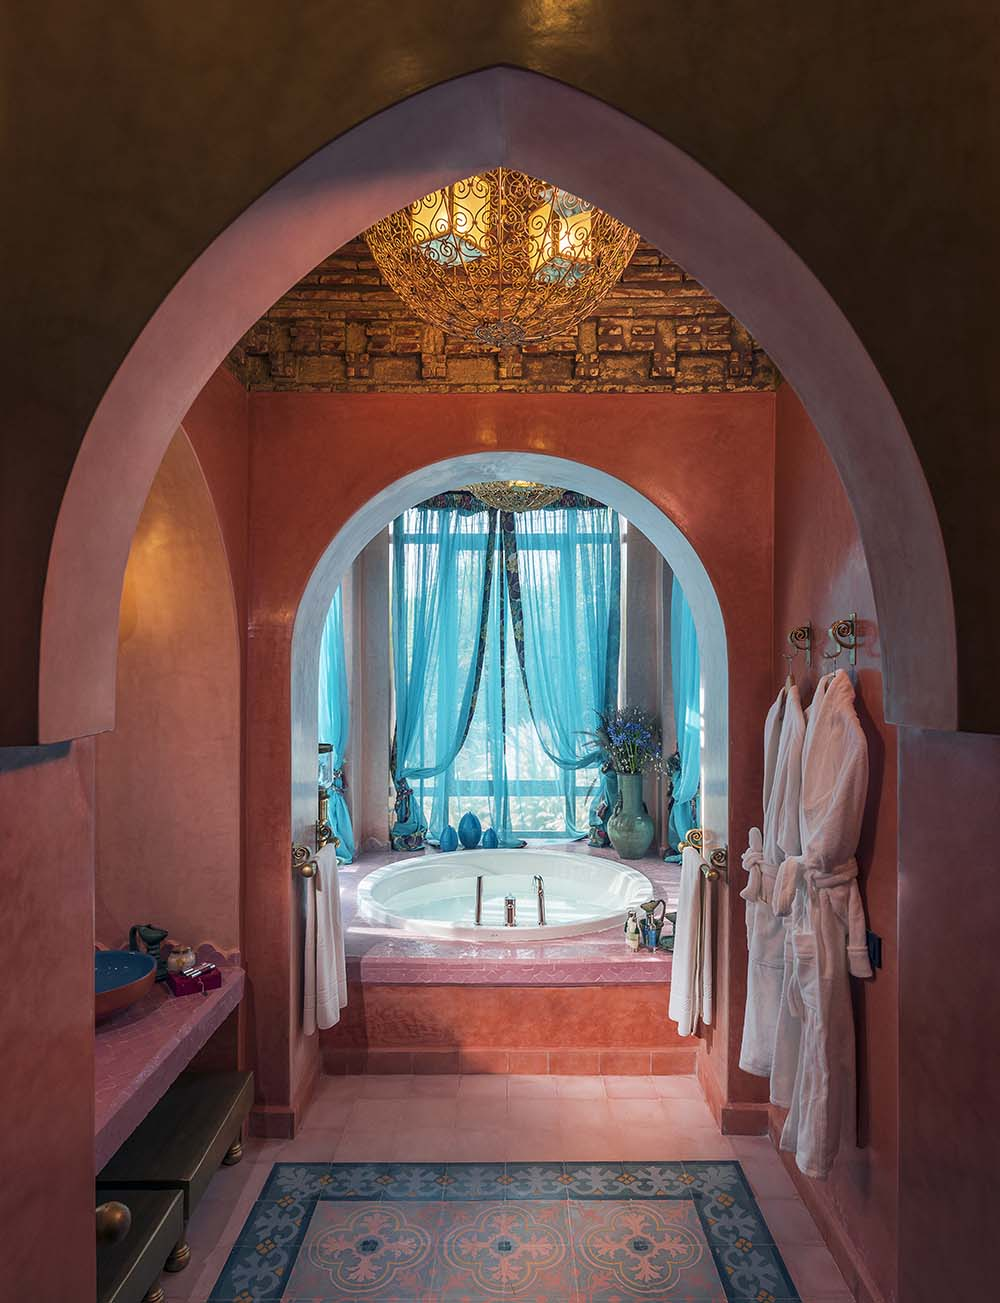 https://www.thesourcemarrakech.com/wp-content/uploads/2017/08/thesource-418kech-copy.jpg